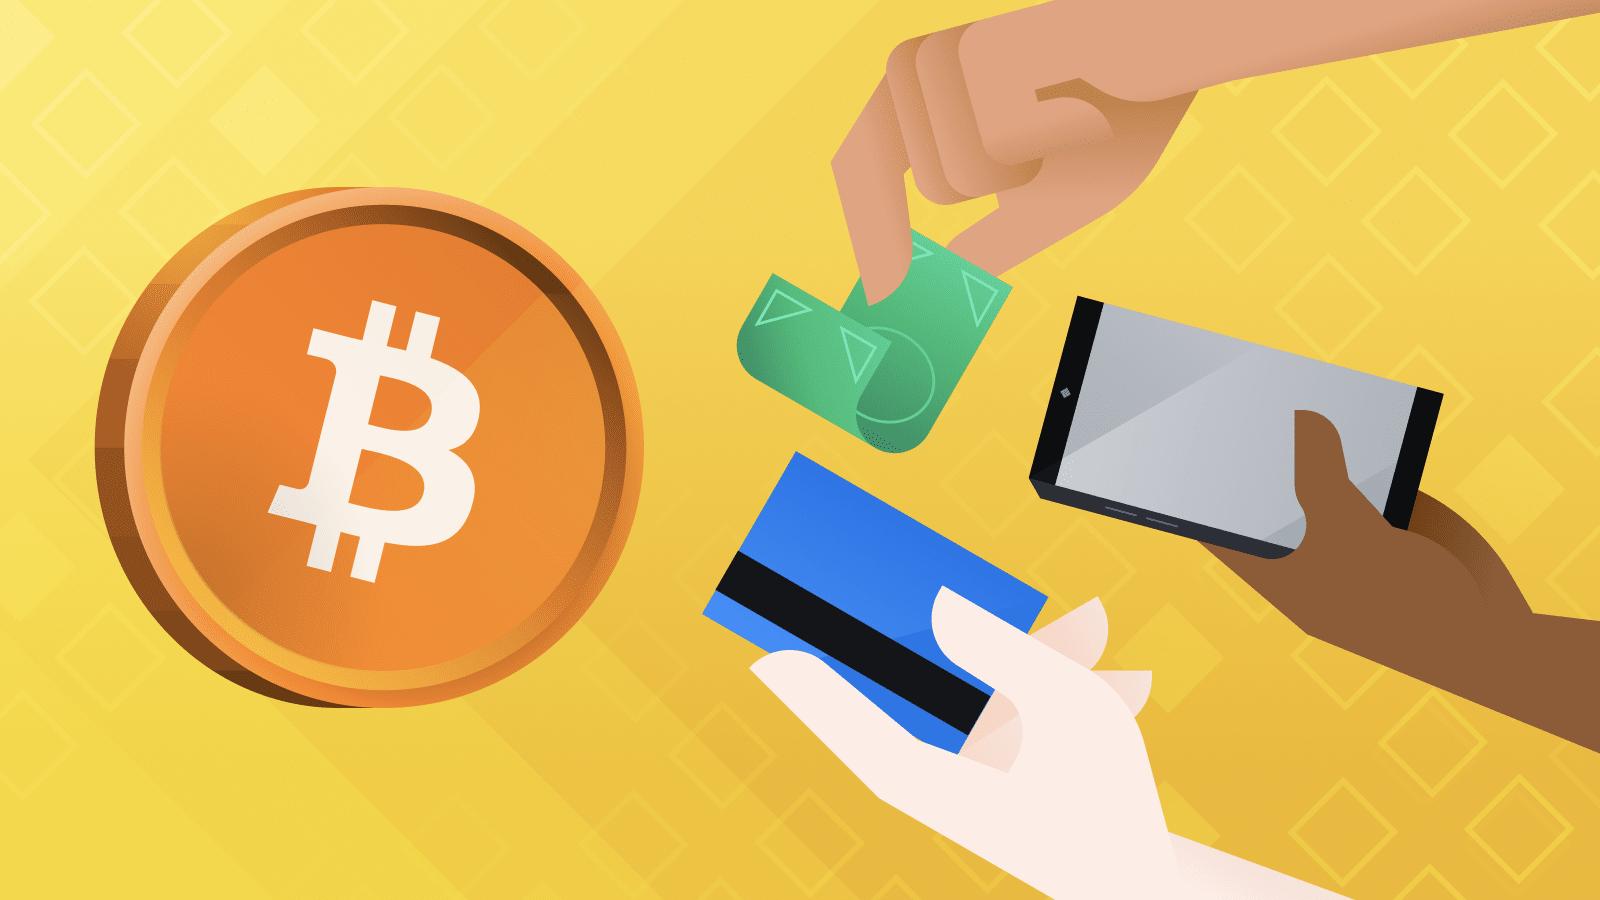 Sell bitcoins blockchain premier sports betting ghana